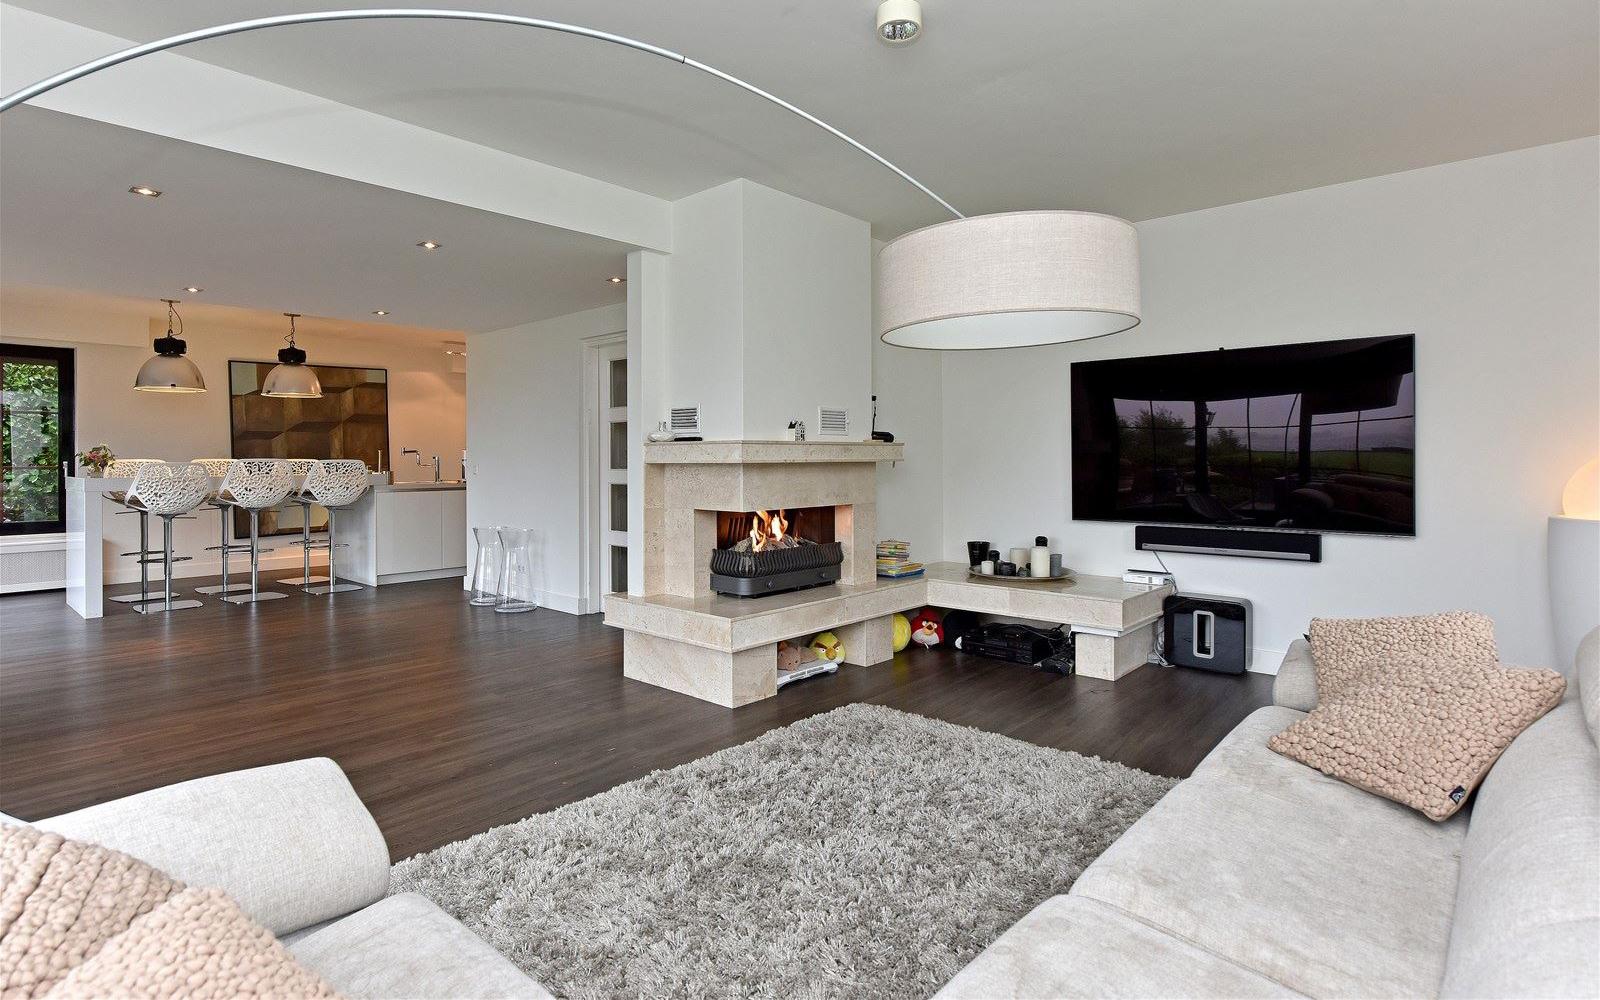 Villa André Hazes, Vinkeveen, Vinkeveense plassen, Zuidplas, Amsterdam, Utrecht, Villa, Te koop, Woonkamer, Lounge, Tuin, Haard, Design, Modern